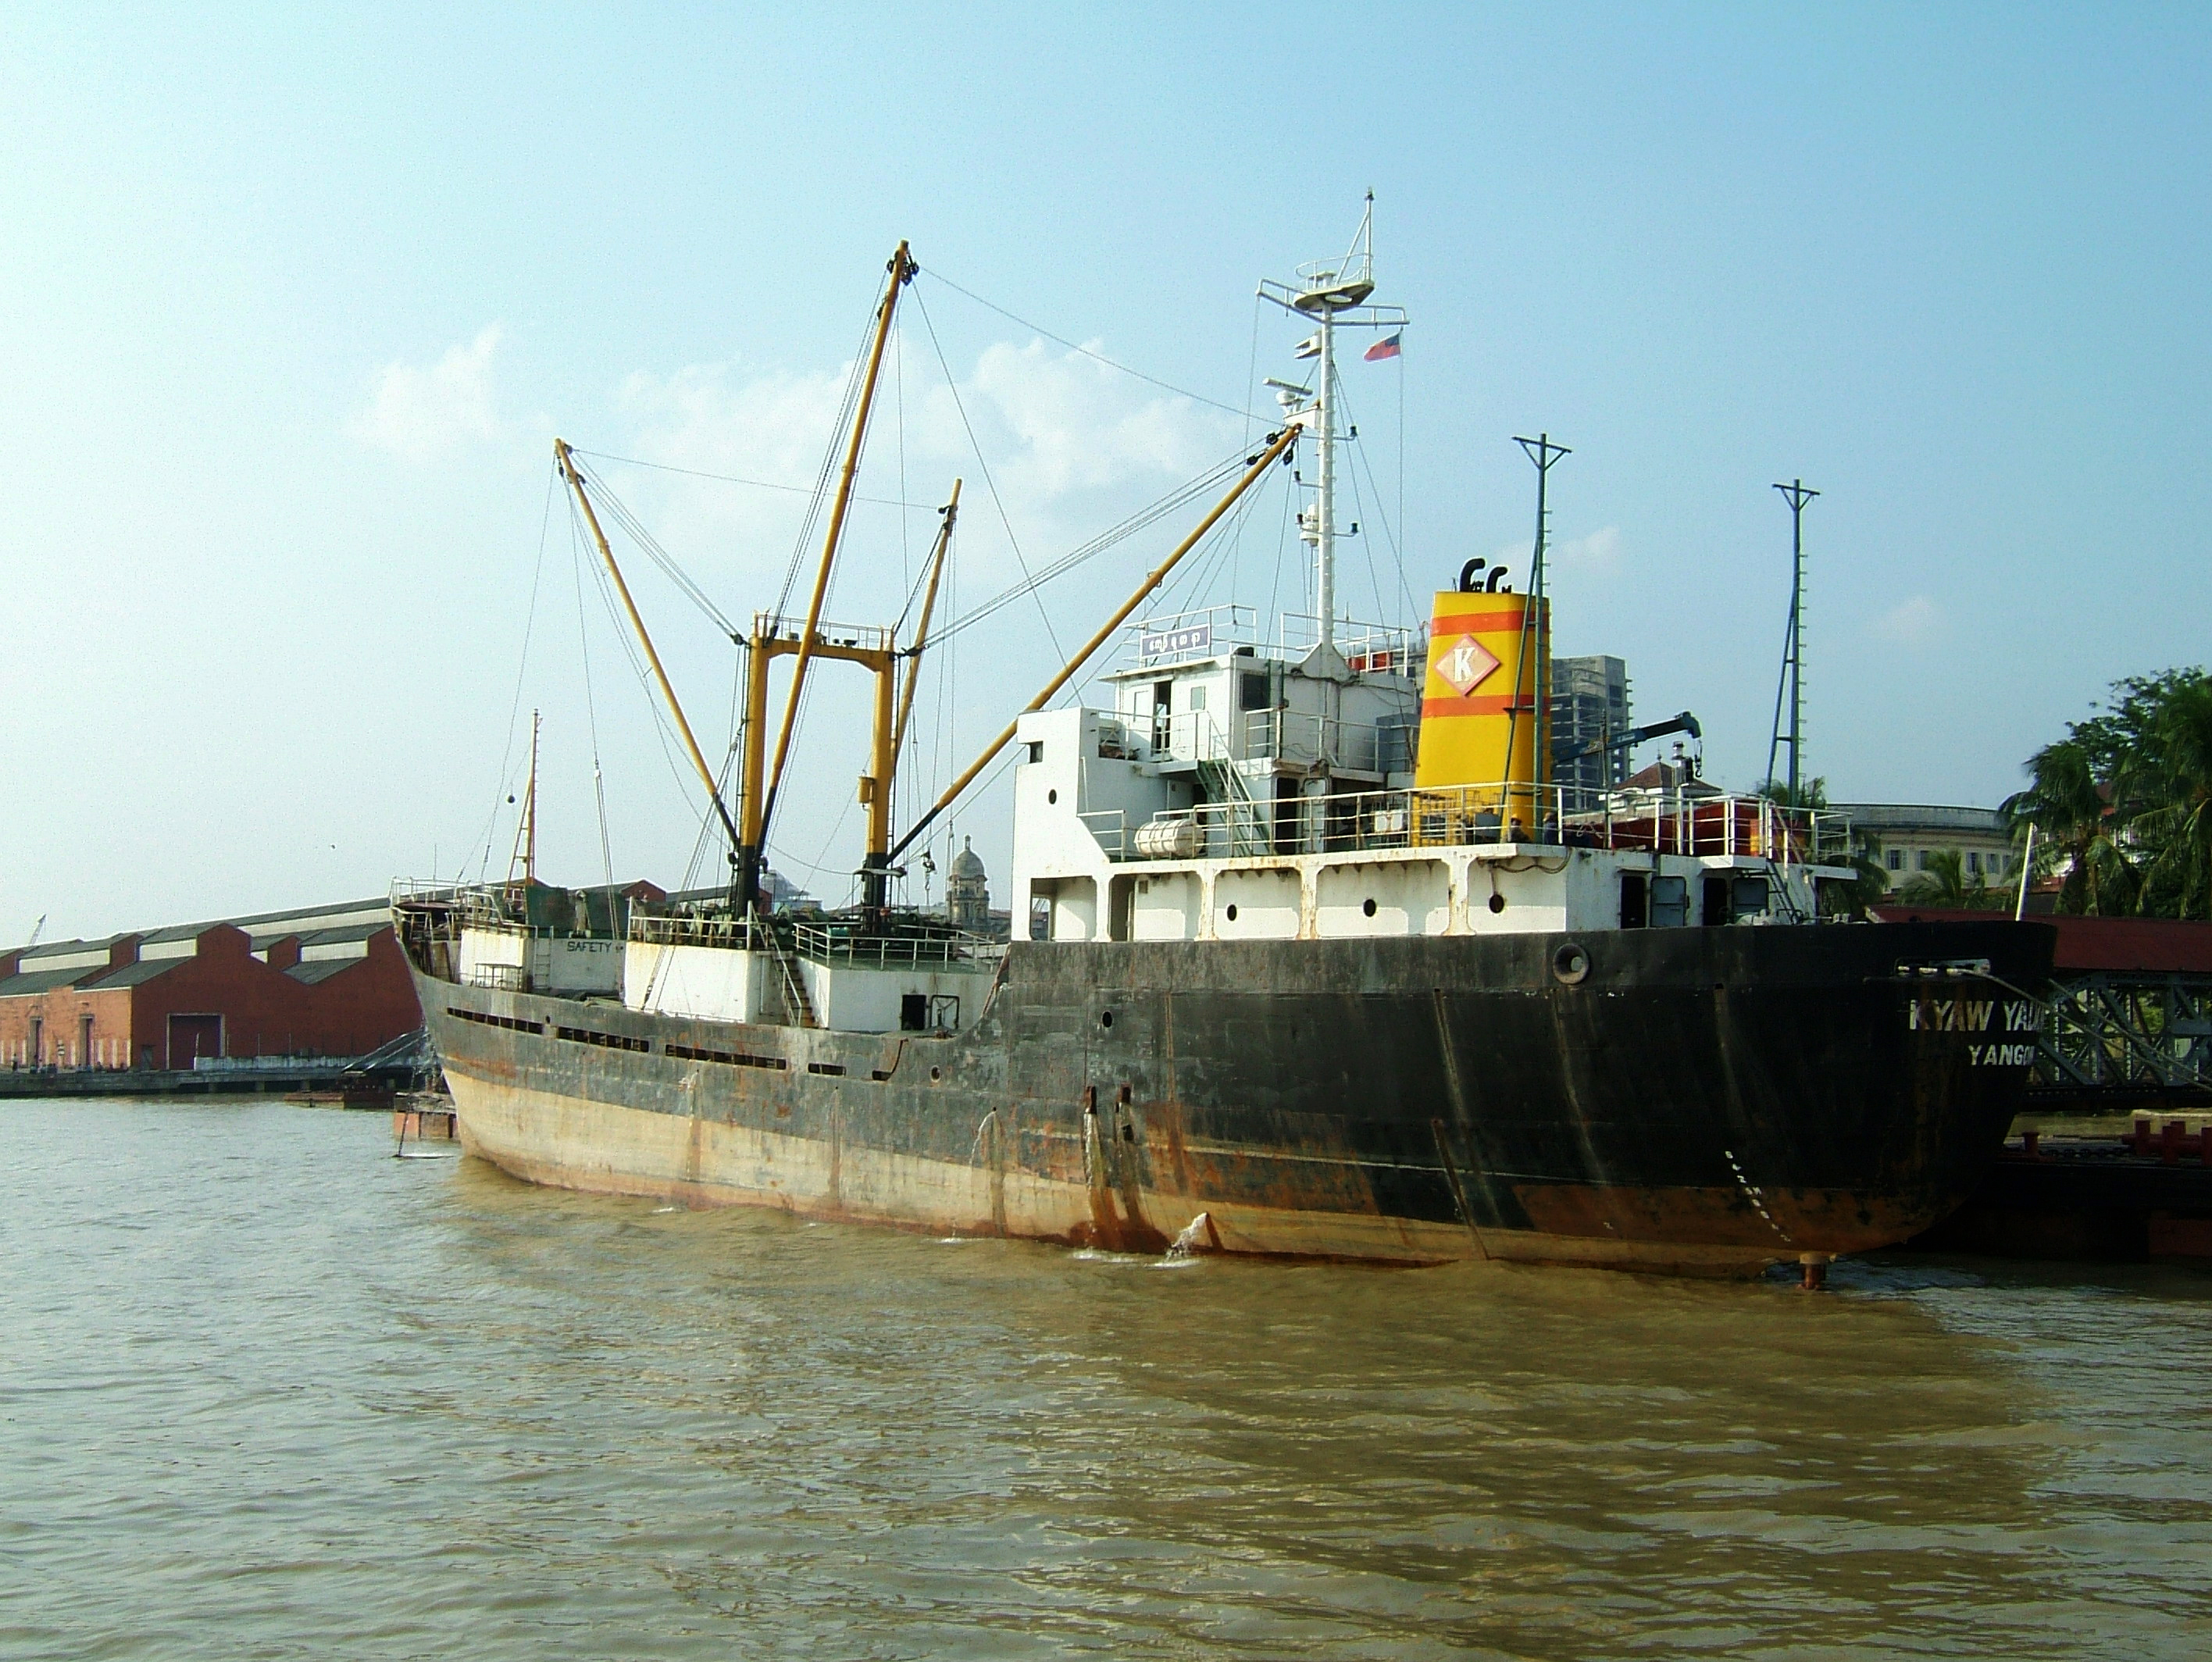 MV Kyaw Yadanar Yangon port Myanmar Oct 2004 01